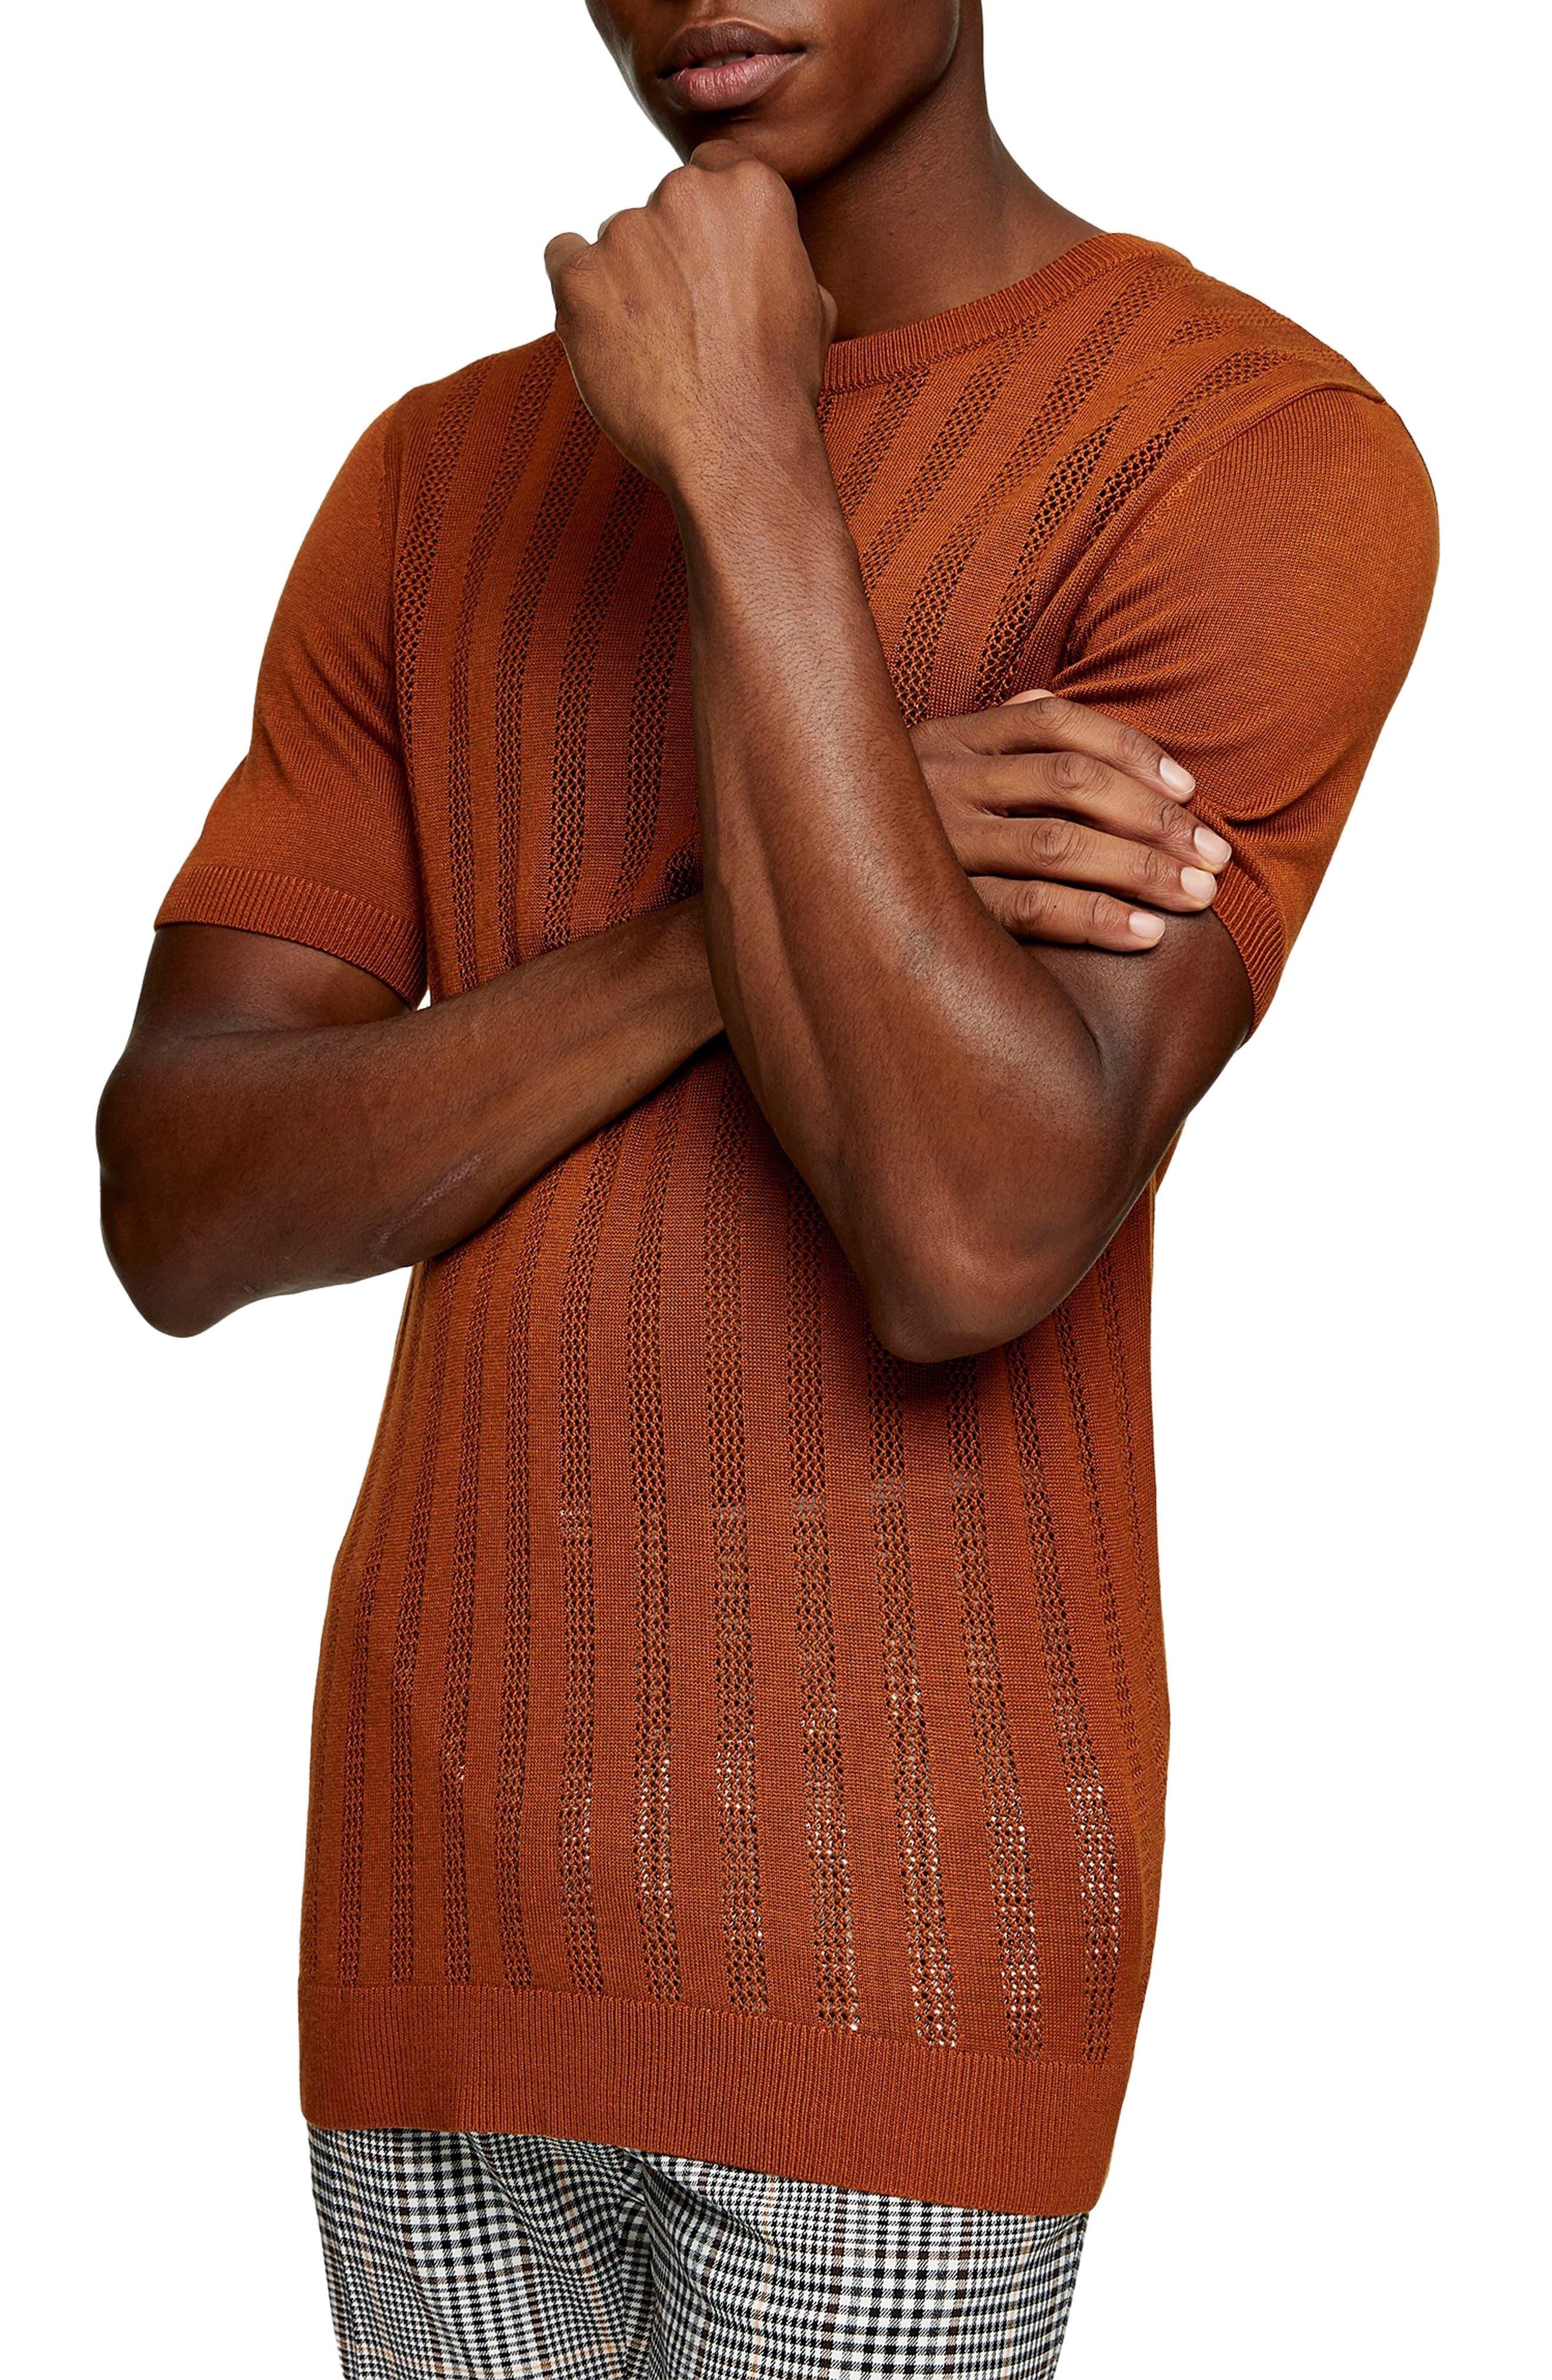 1960s Mens Shirts | 60s Mod Shirts, Hippie Shirts Mens Topman Slim Fit Mesh Effect Sweater Knit T-Shirt Size X-Large - Brown $50.00 AT vintagedancer.com